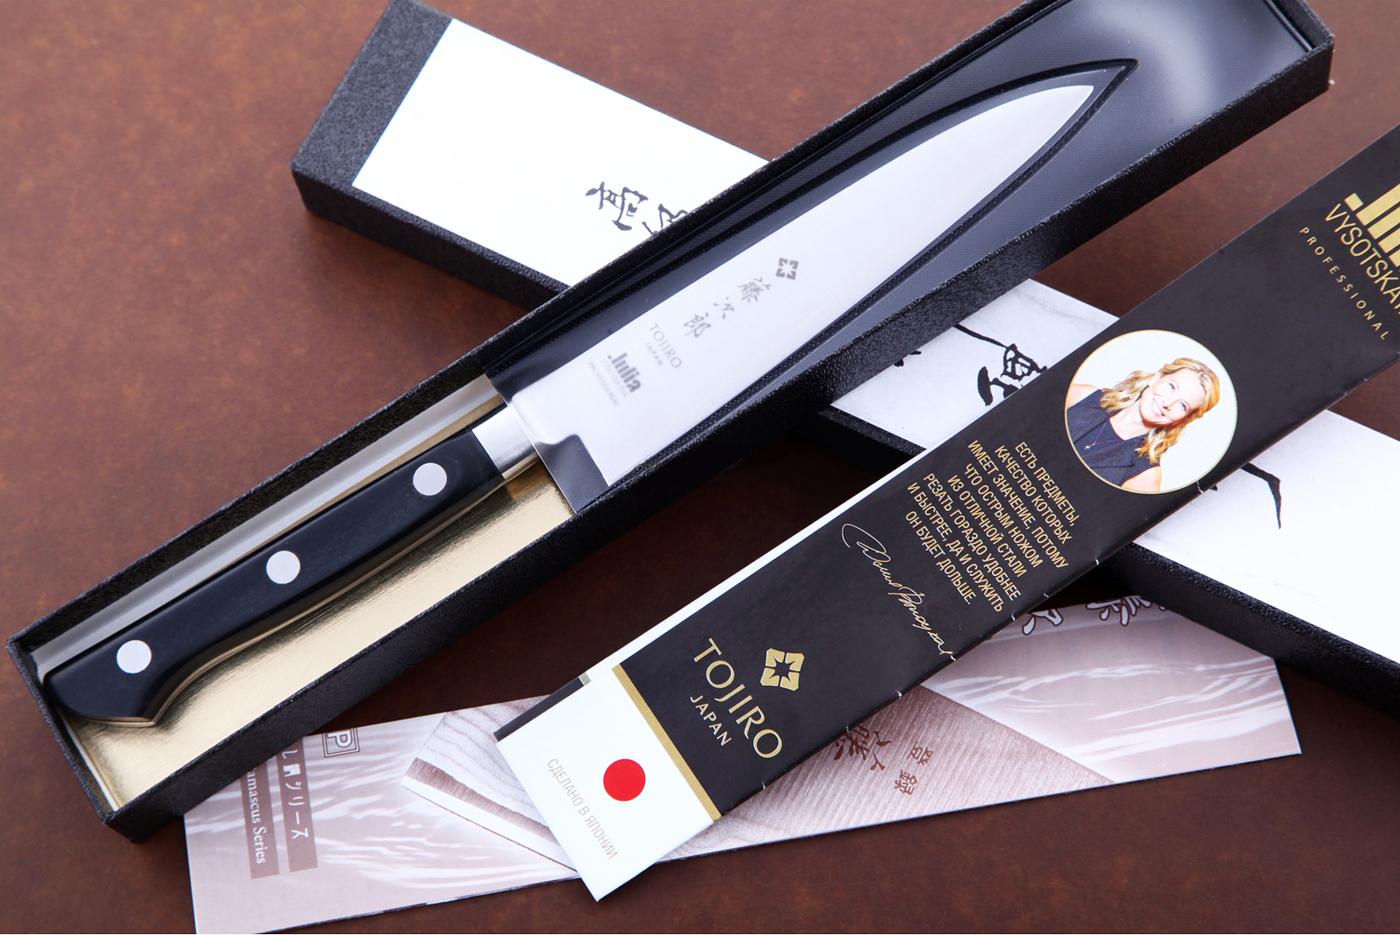 Фото 6 - Кухонный нож для овощей, Julia Vysotskaya Professional, TOJIRO, F-650 JV, сталь VG-10, в картонной коробке